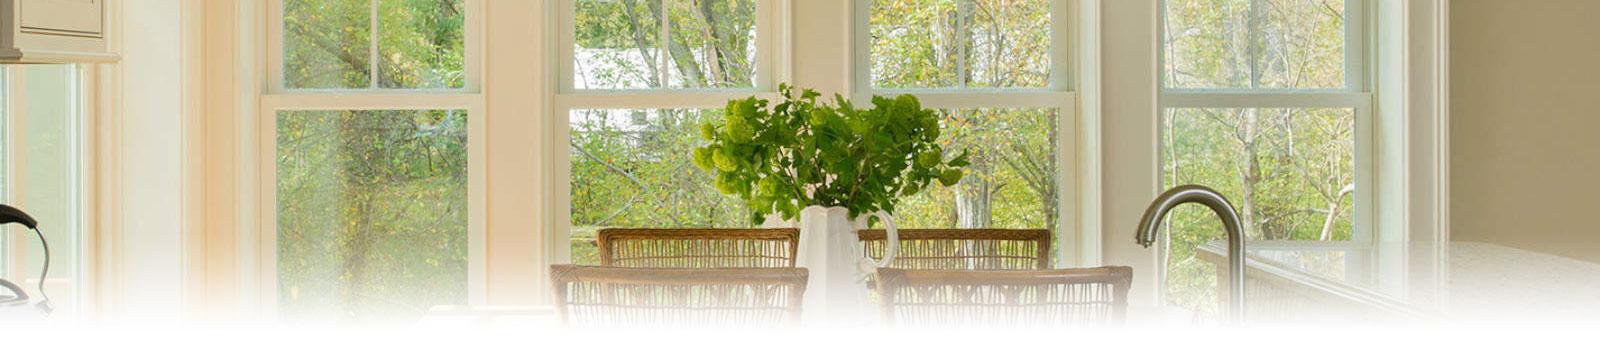 Harvey Elite Windows | Professional Window Installation